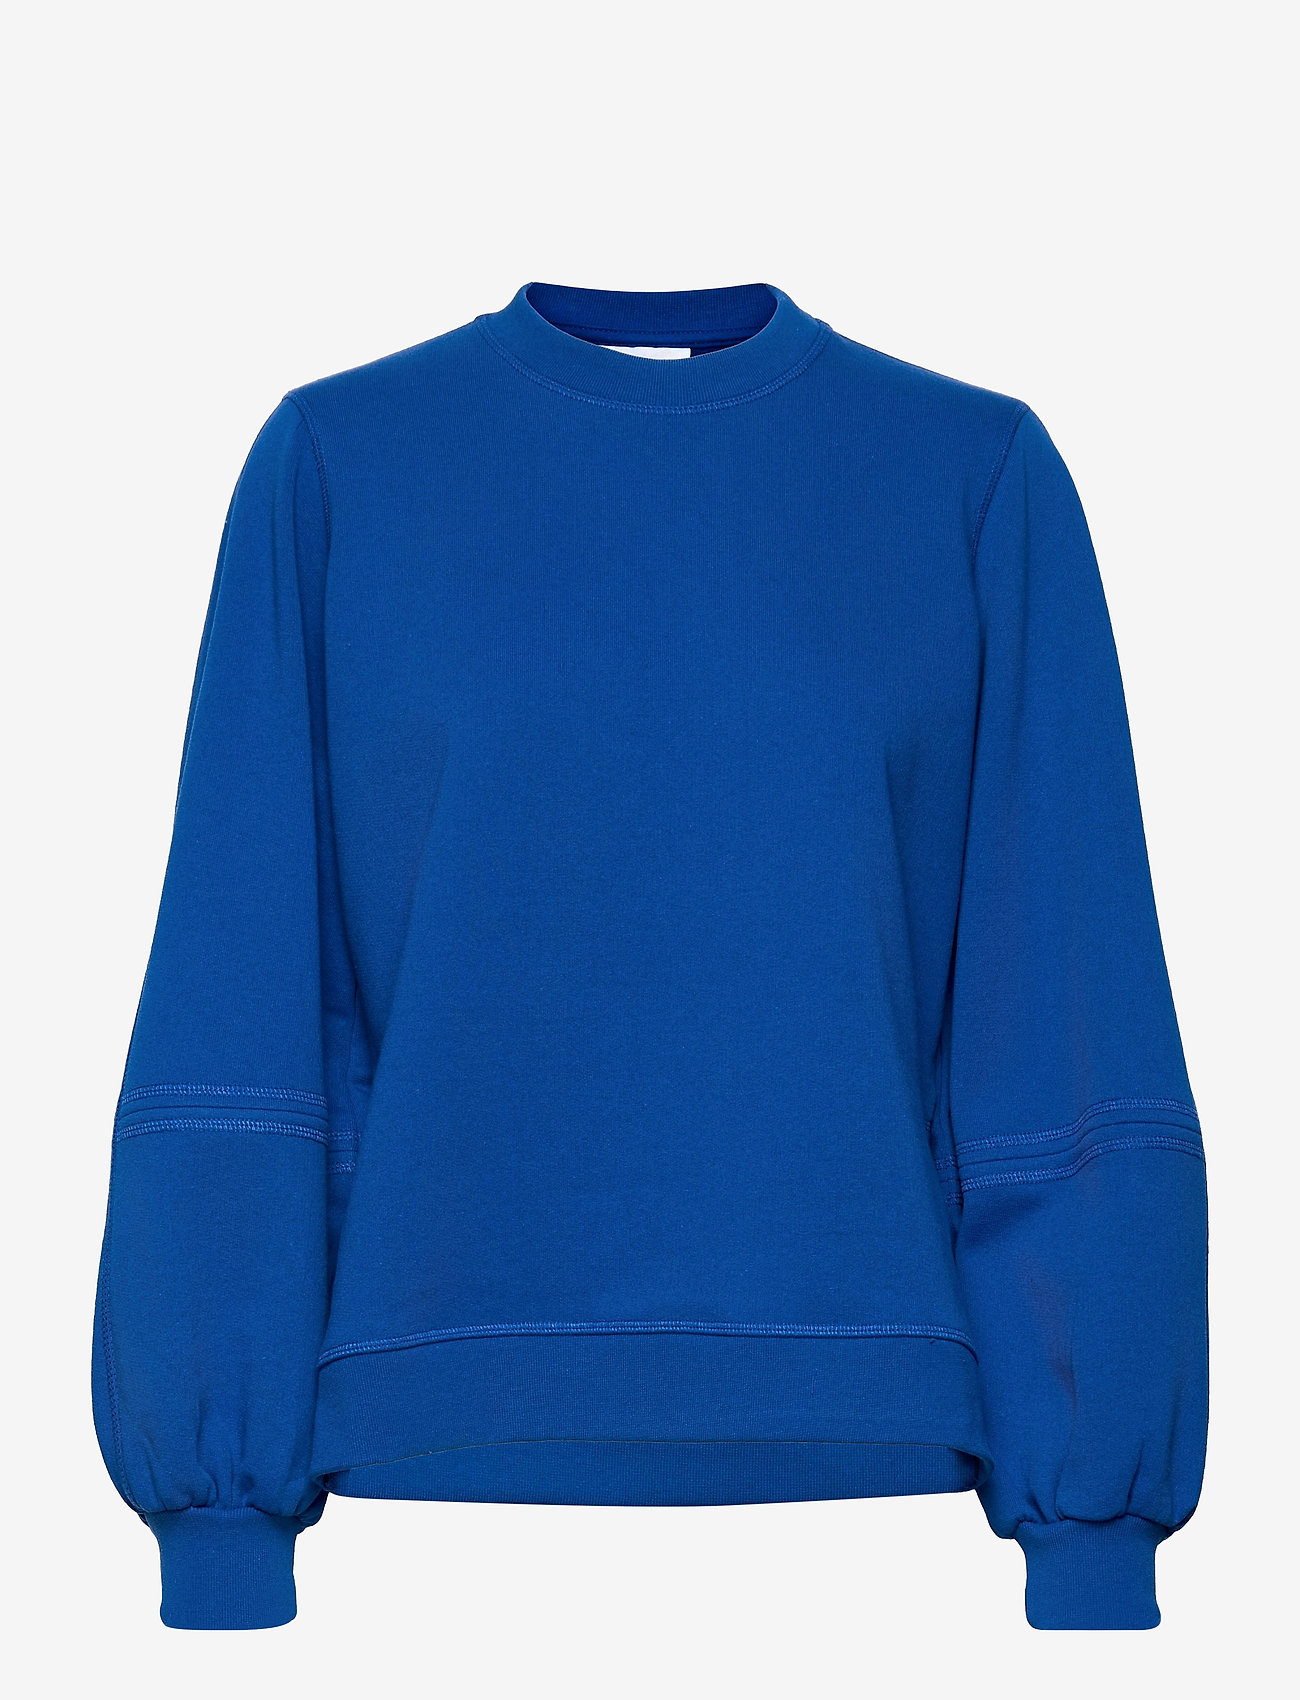 Ganni - Software Isoli - sweatshirts & hoodies - daphne - 0